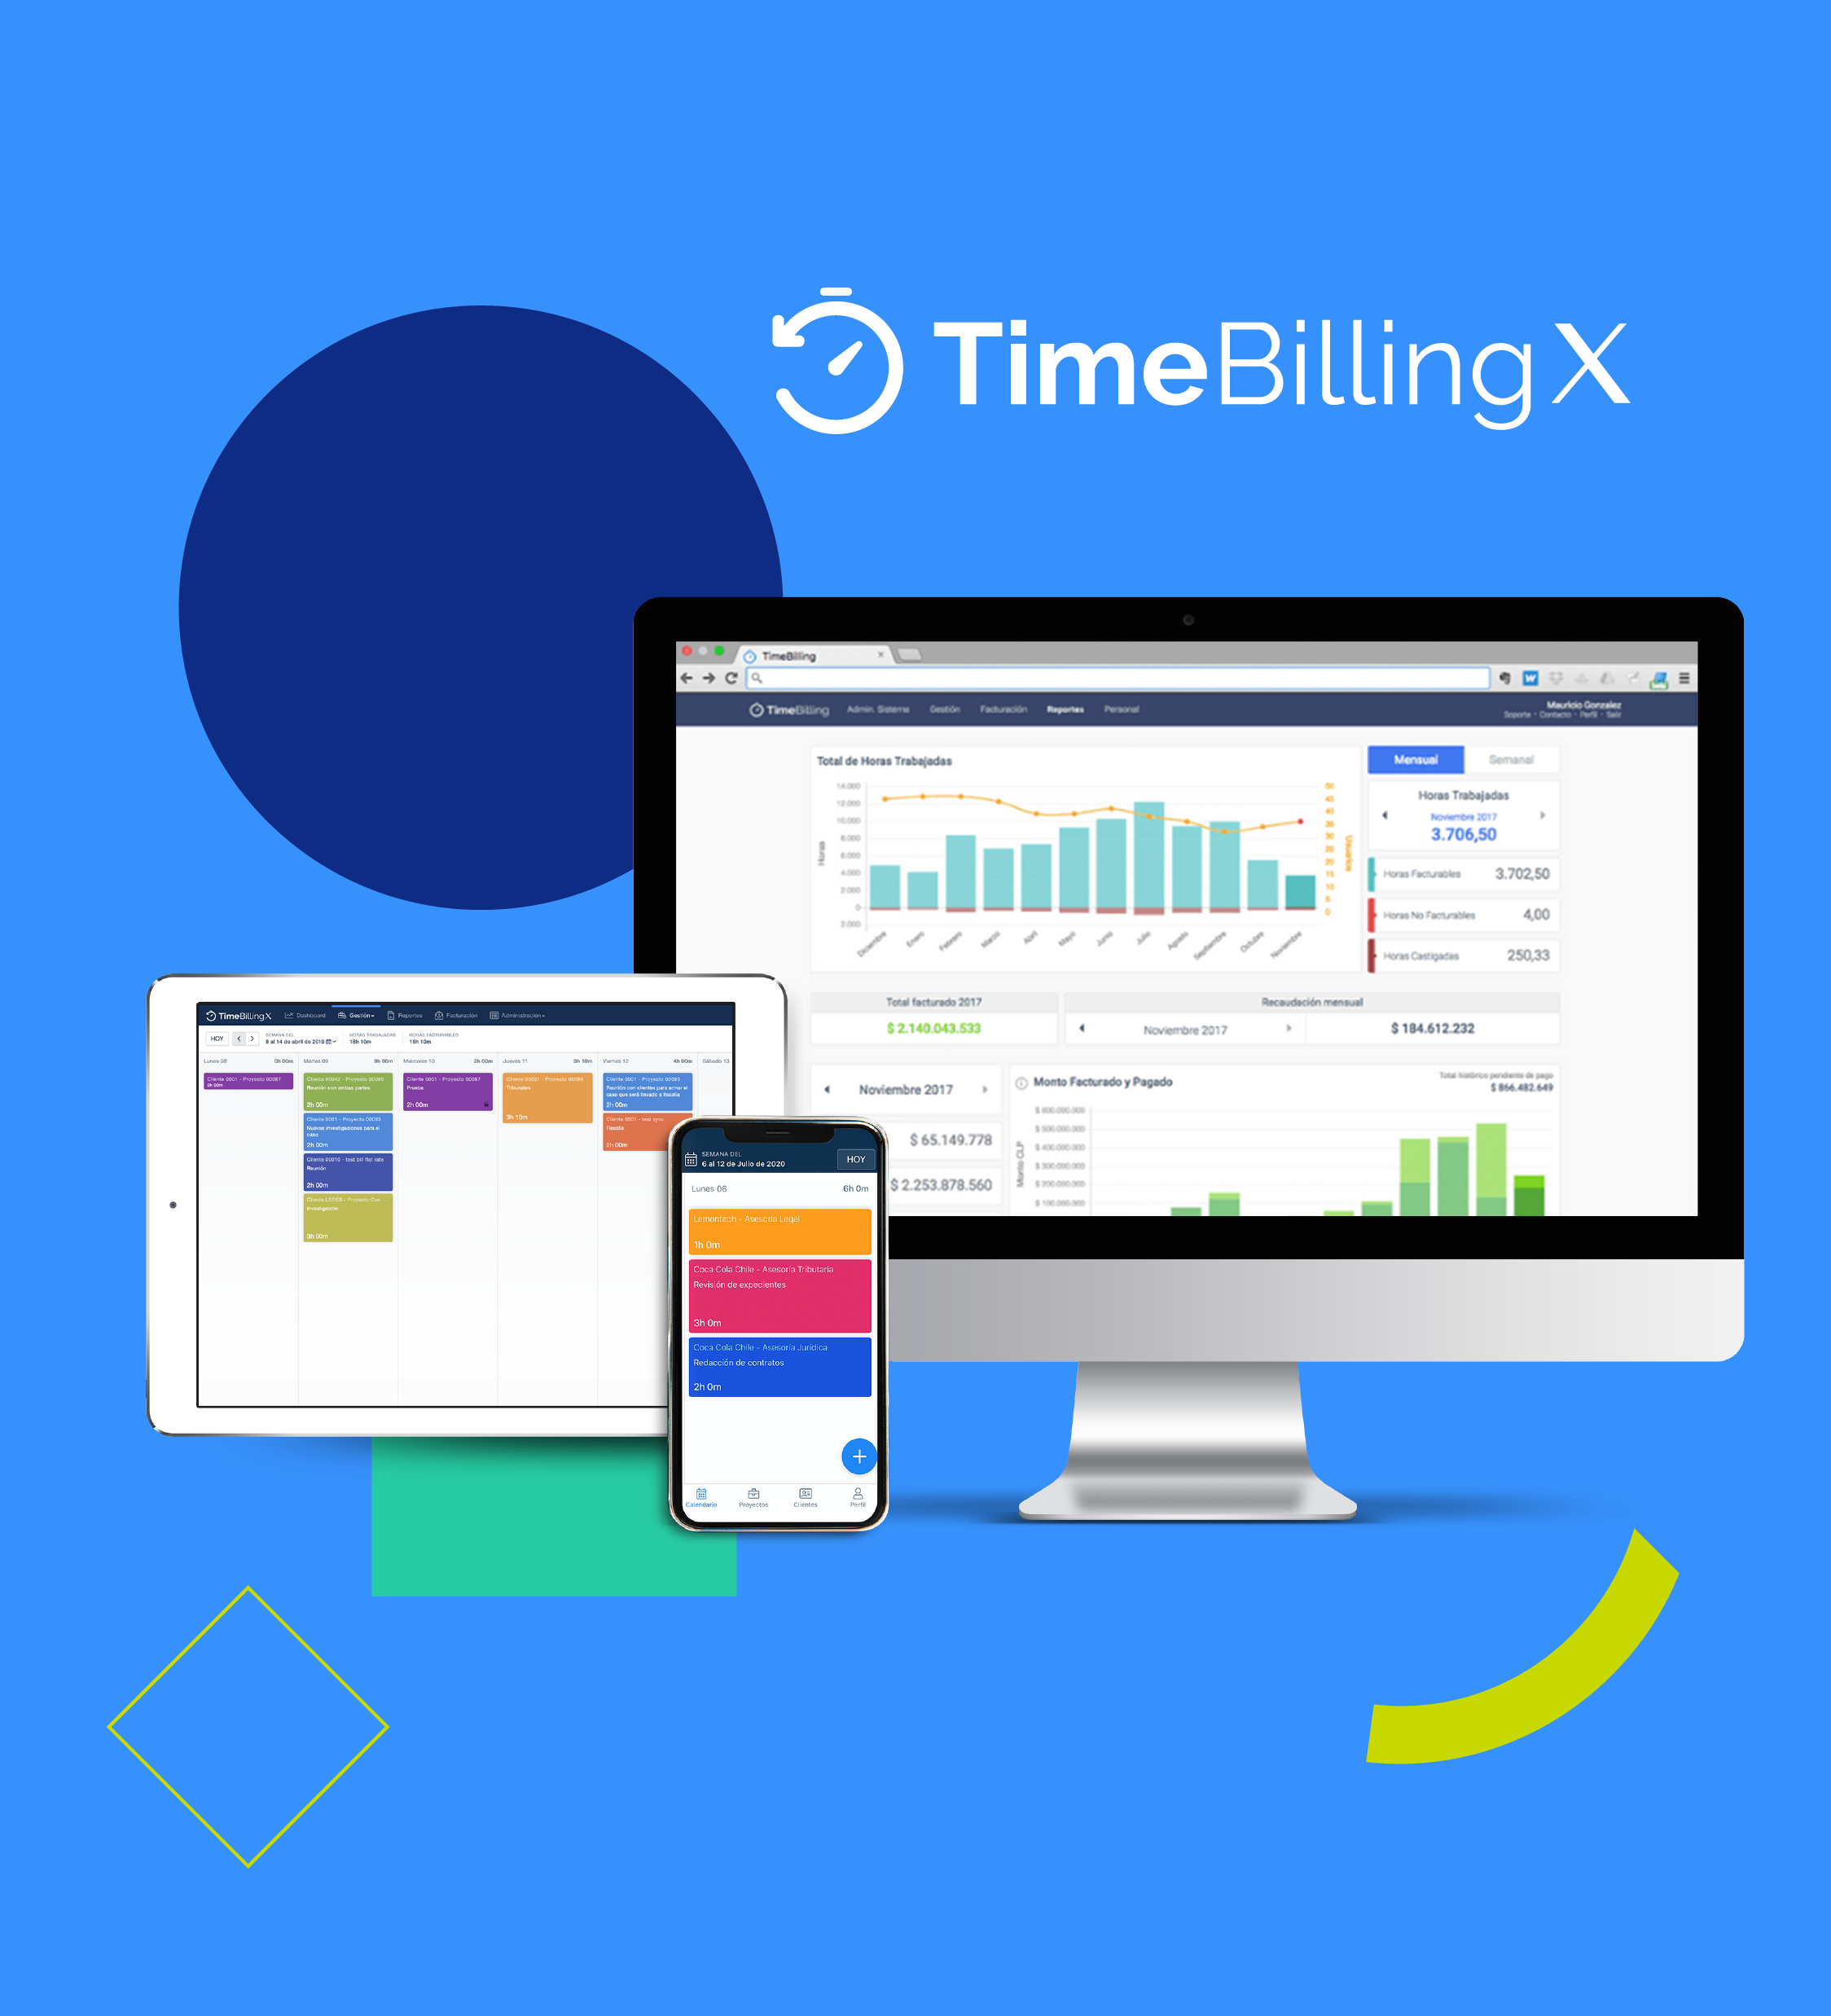 TimeBillingX: guía de herramienta